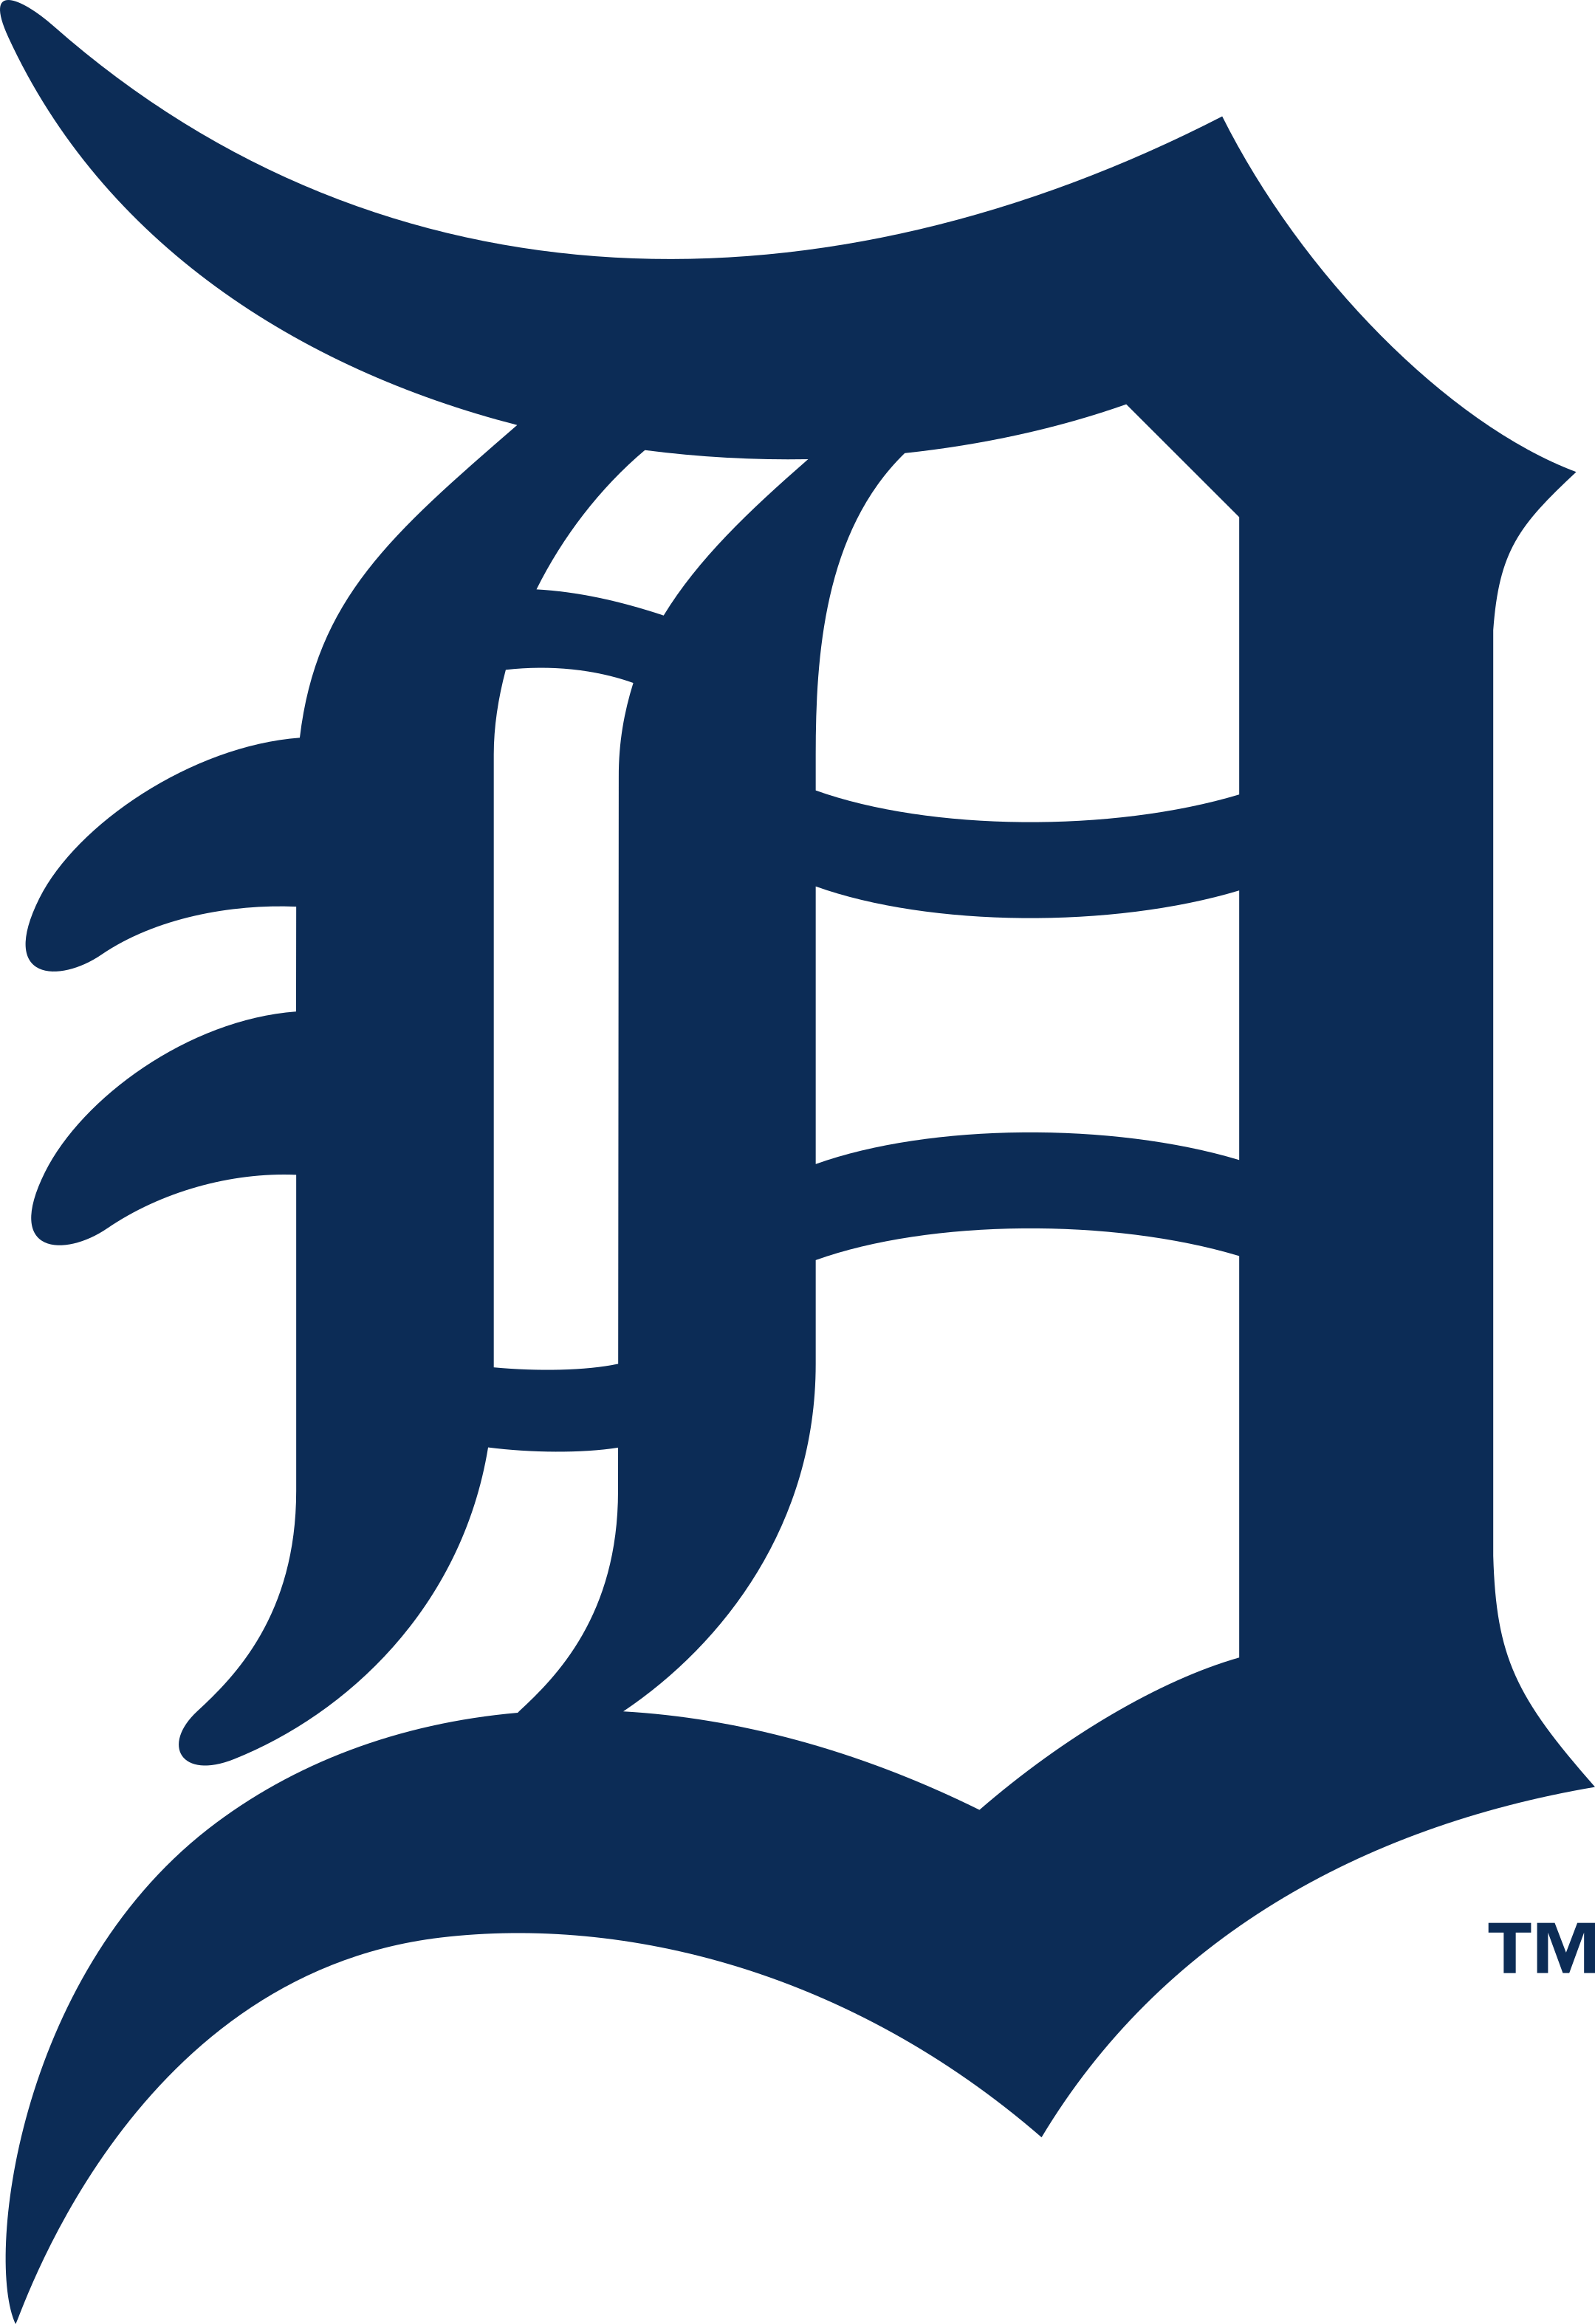 detroit tigers logo 1 - Detroit Tigers Logo